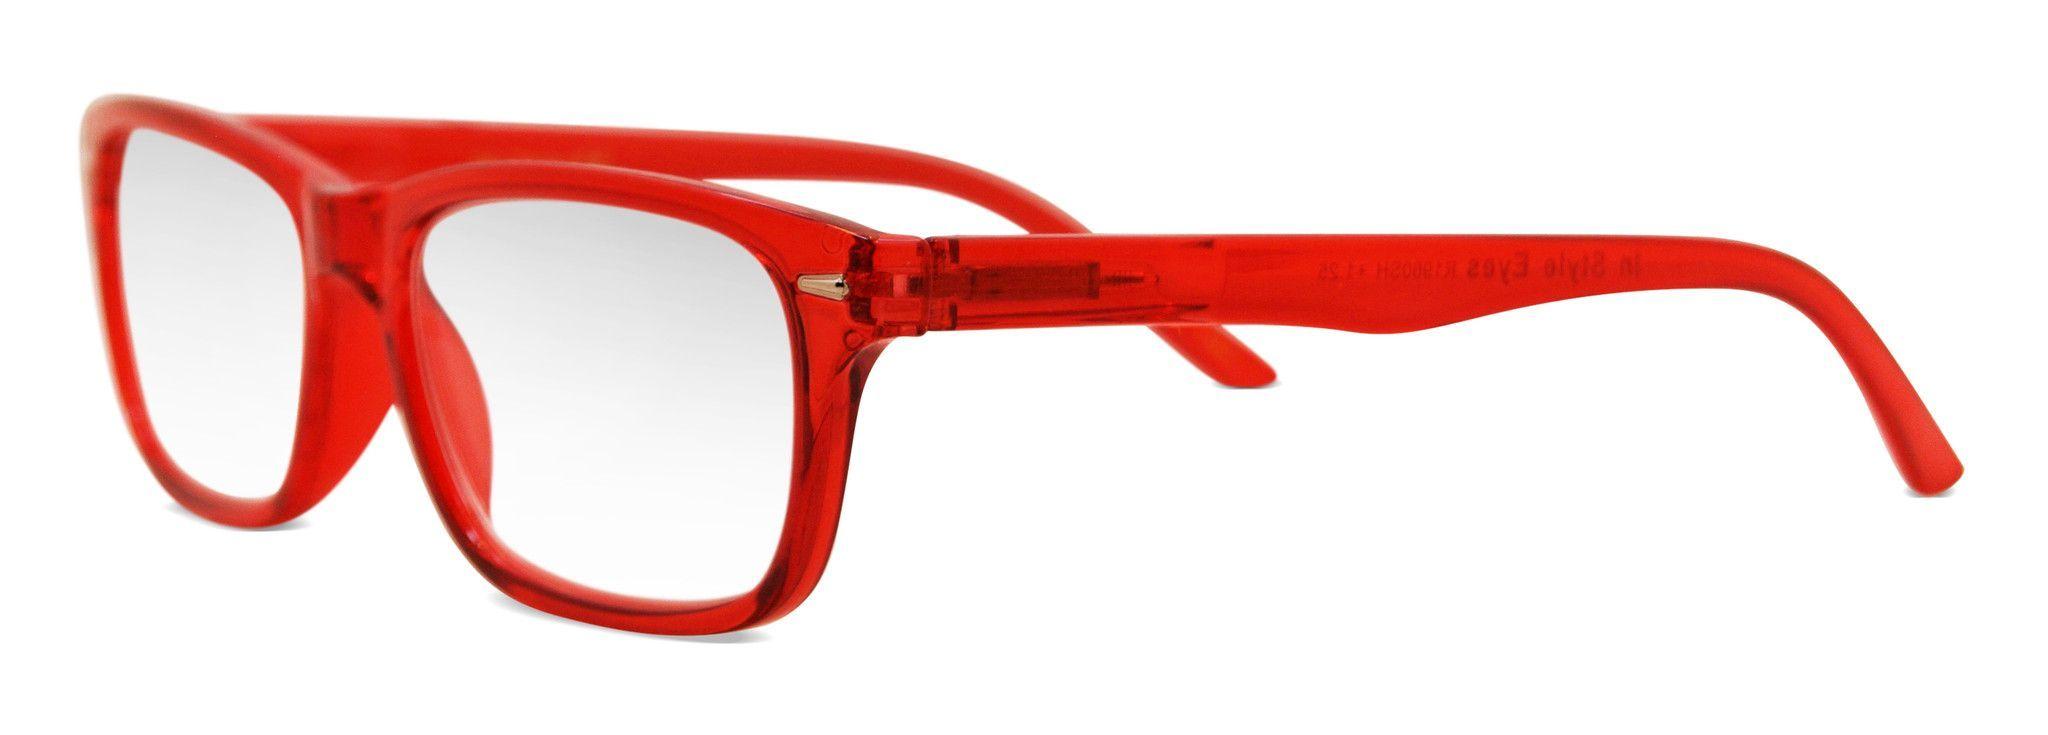 3cb4f7abe22 In Style Eyes Seymore Wayfarer Reading Glasses. Not Bifocals